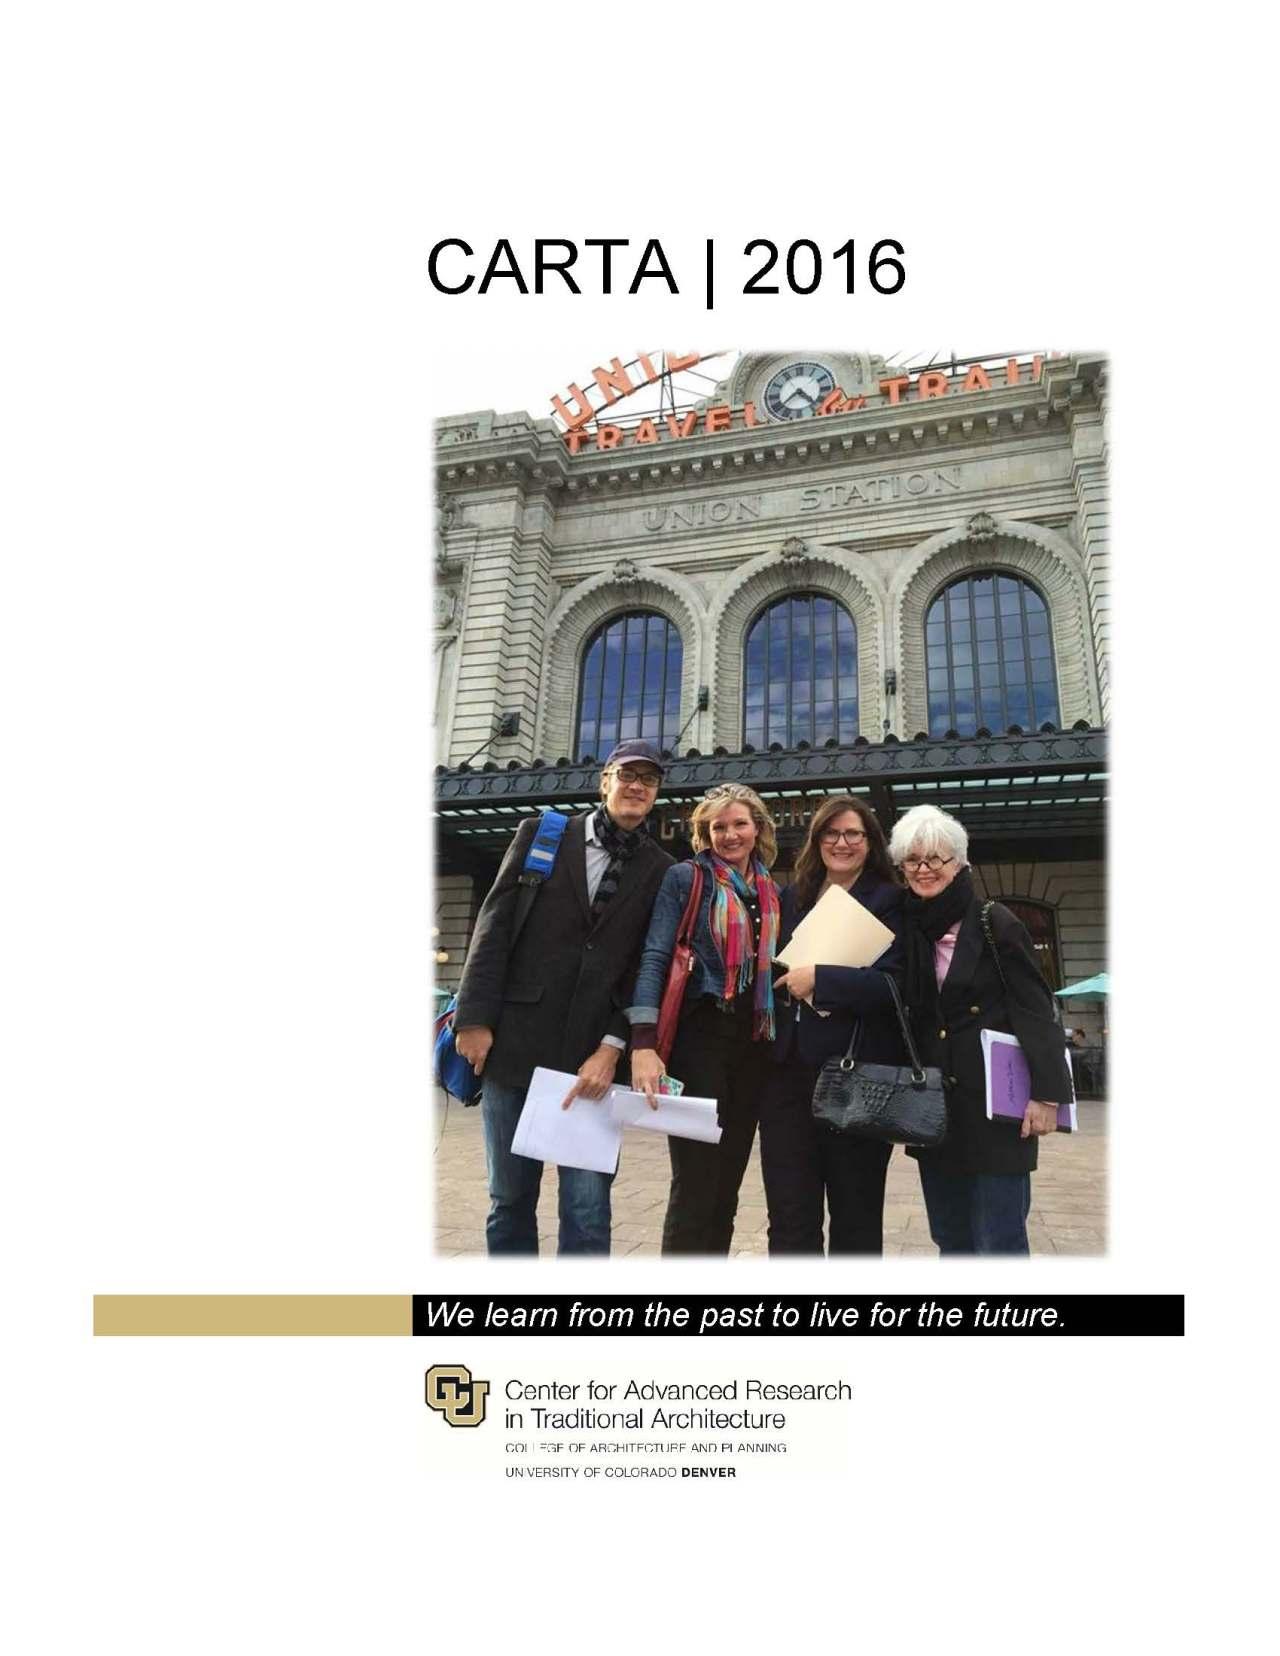 carta-2016_page_01